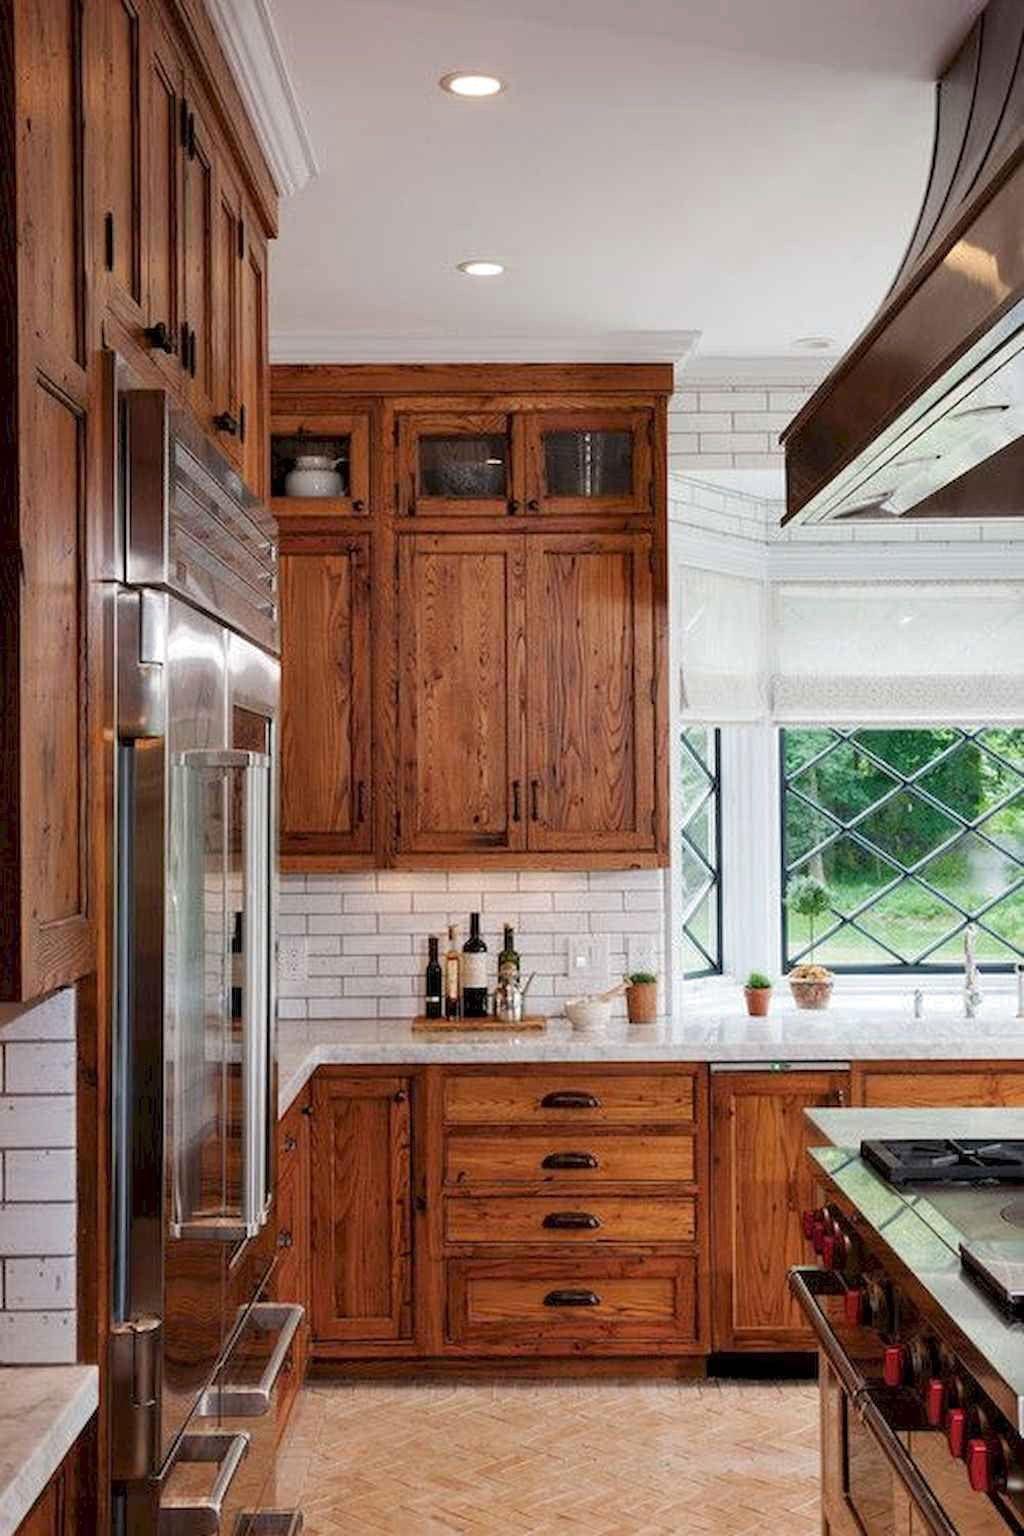 79 Favourite Farmhouse Kitchen Ideas On A Budget Farmhousekitchenonabudget Farmh Rustic Kitchen Cabinets Kitchen Cabinet Design Natural Wood Kitchen Cabinets